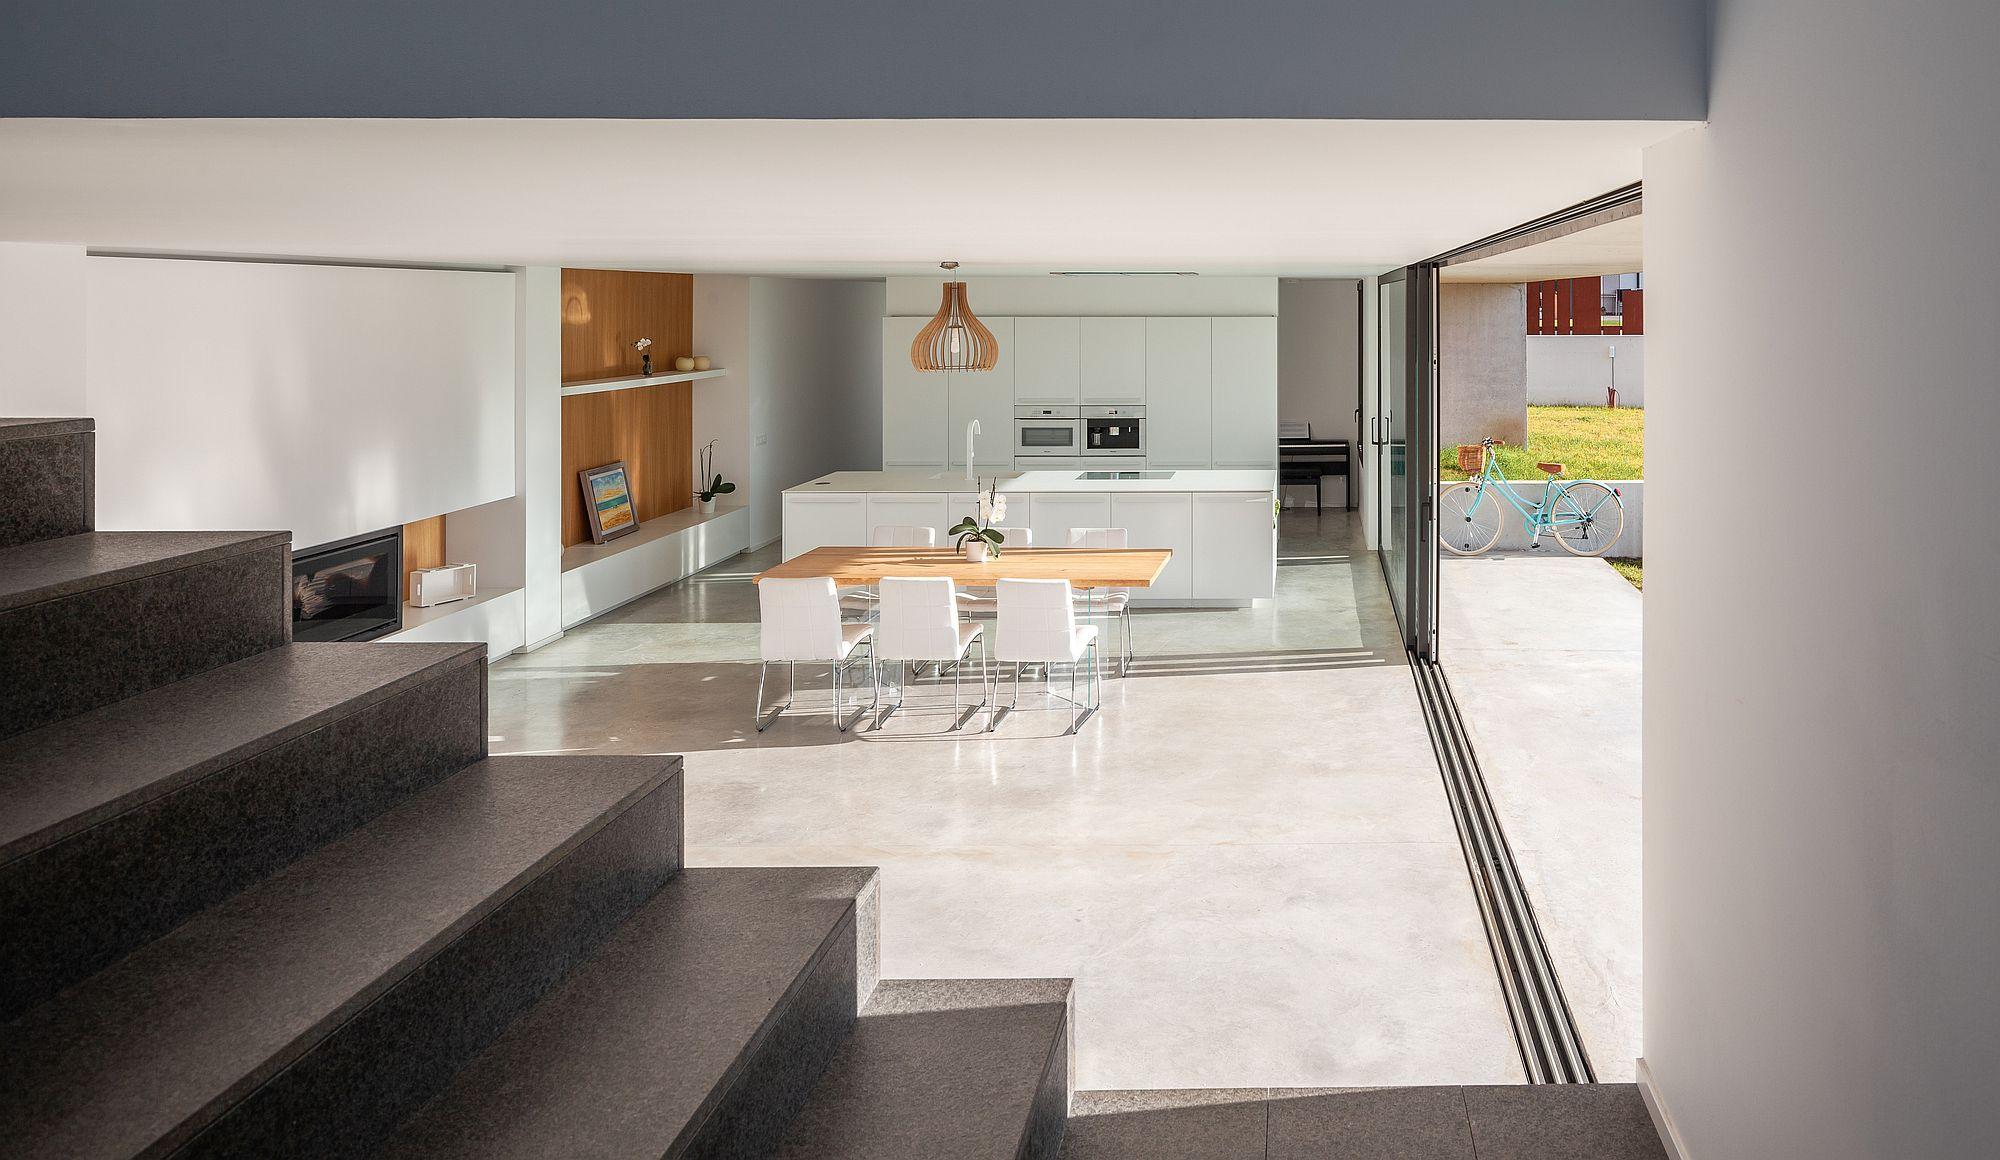 Natural lighting illuminates the kitchen and dining area beautifully